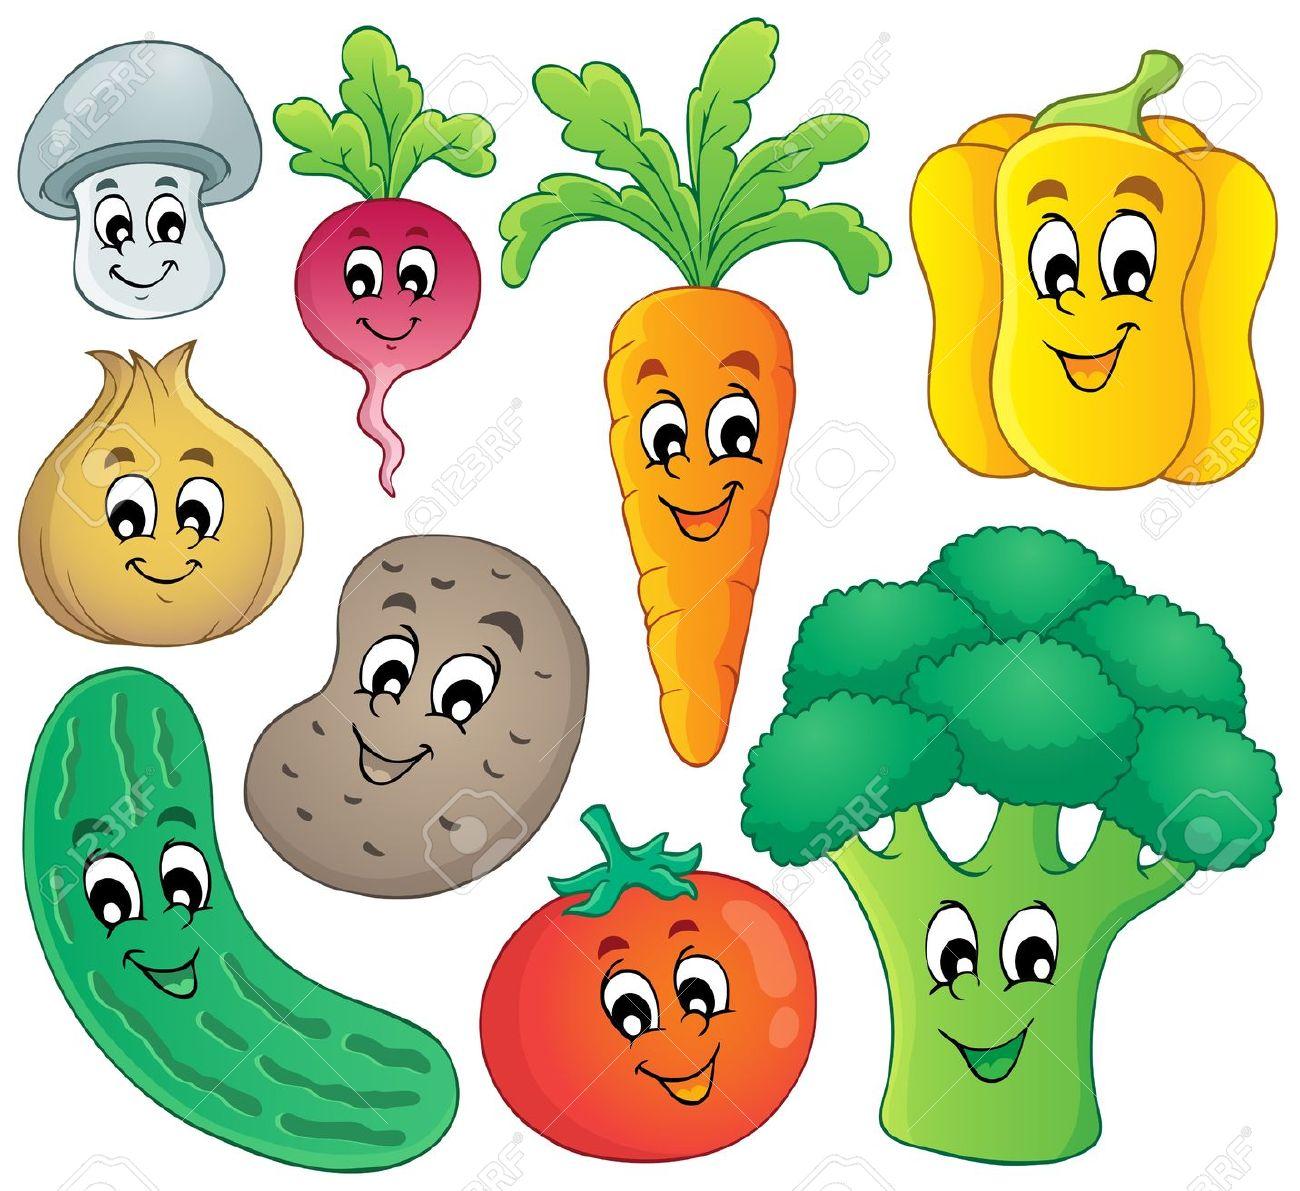 Clipart vegetables 7 » Clipart Station.